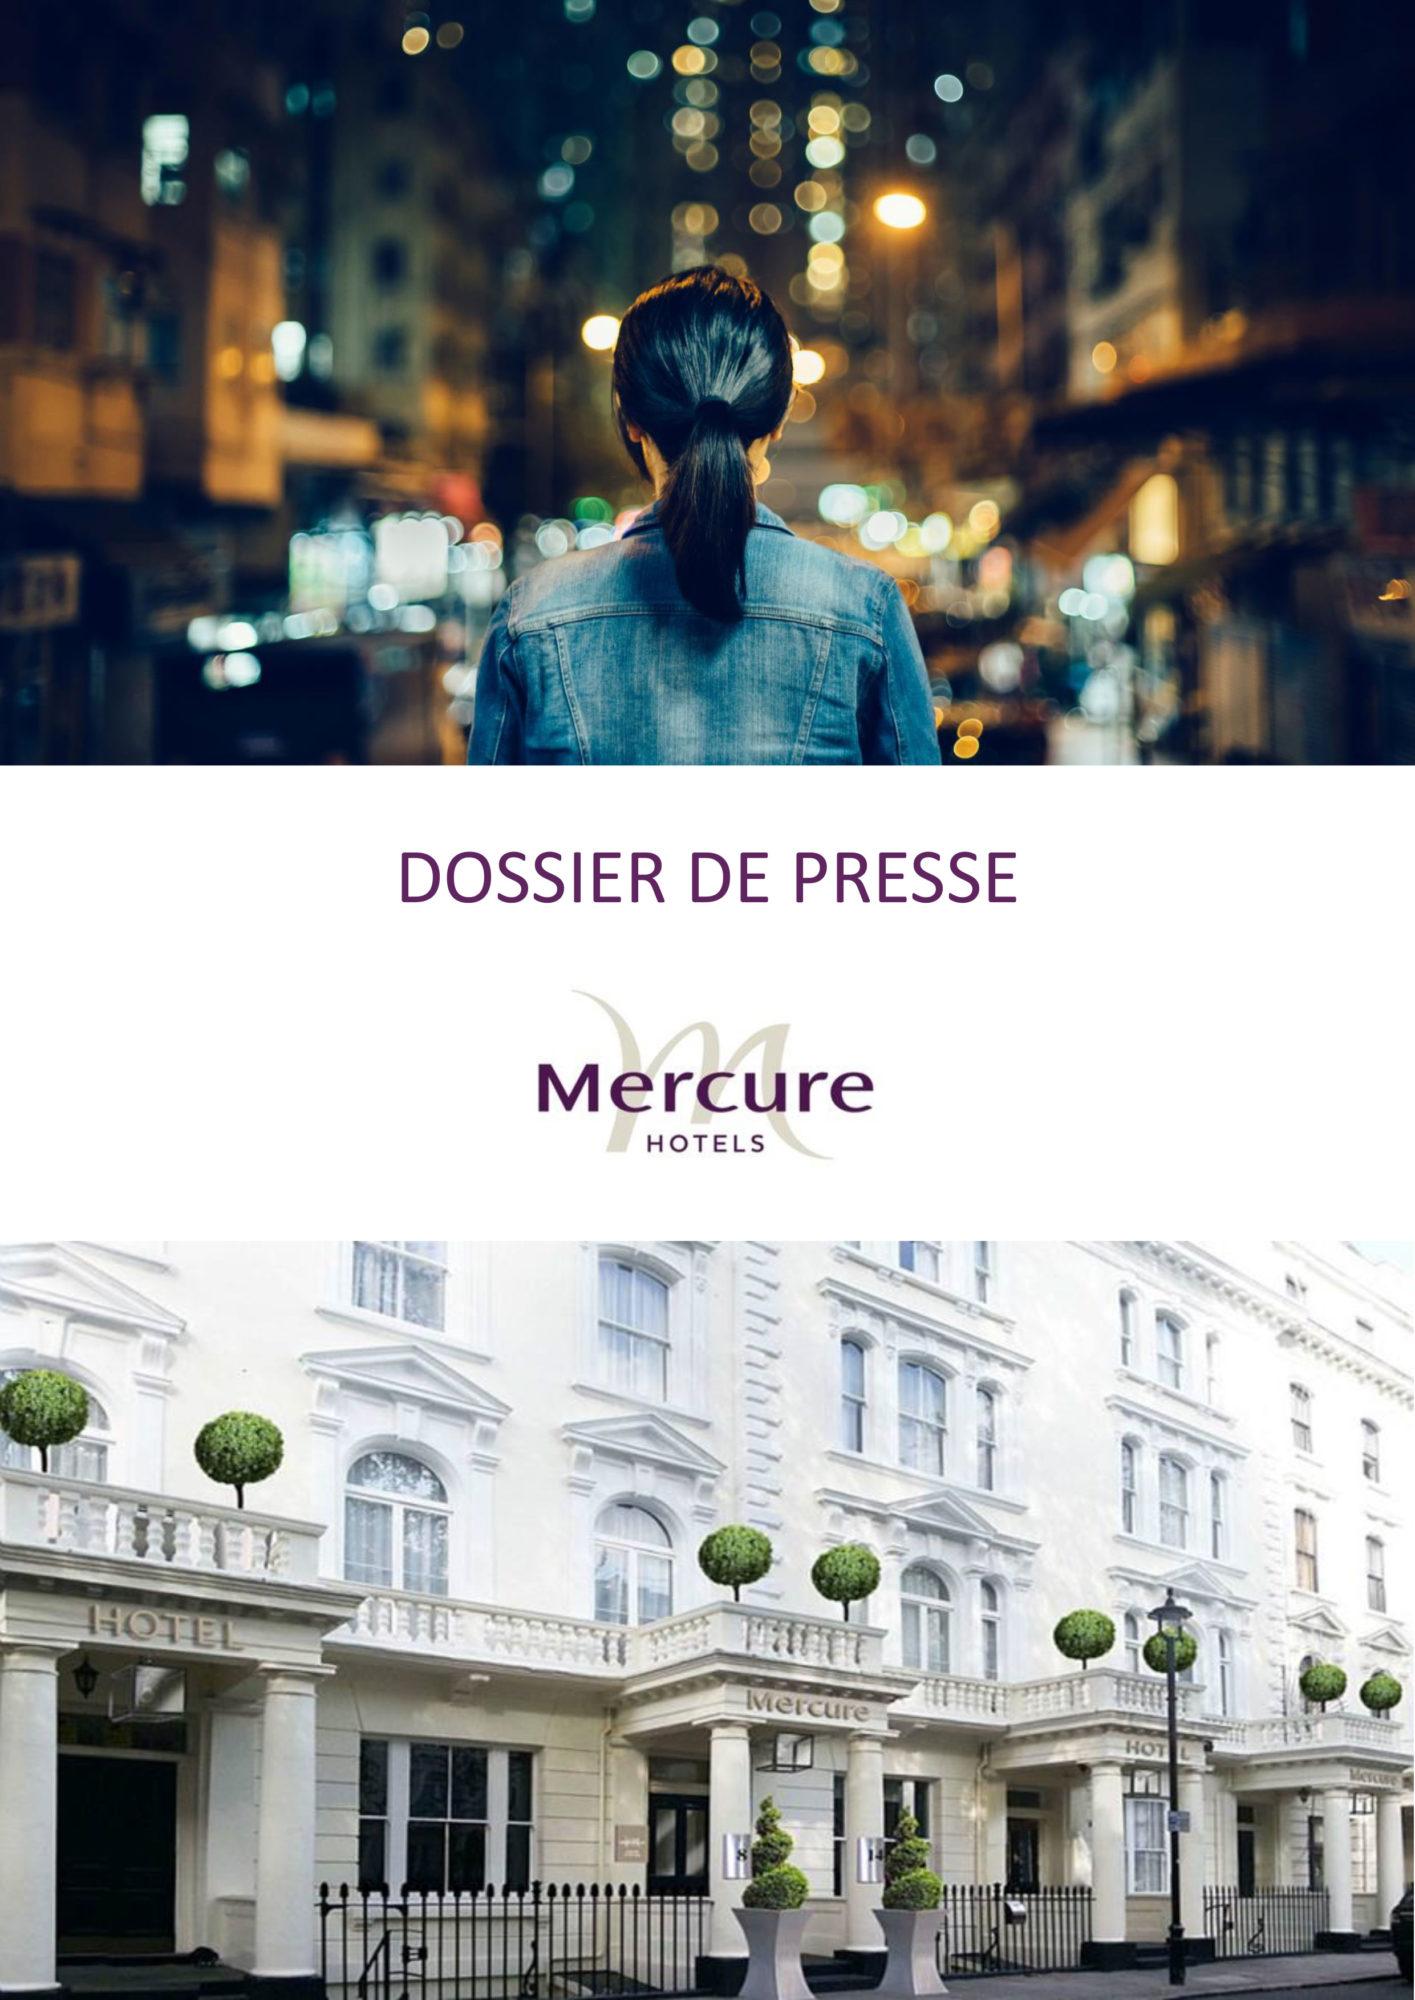 Mercure Hôtels - dossier de presse